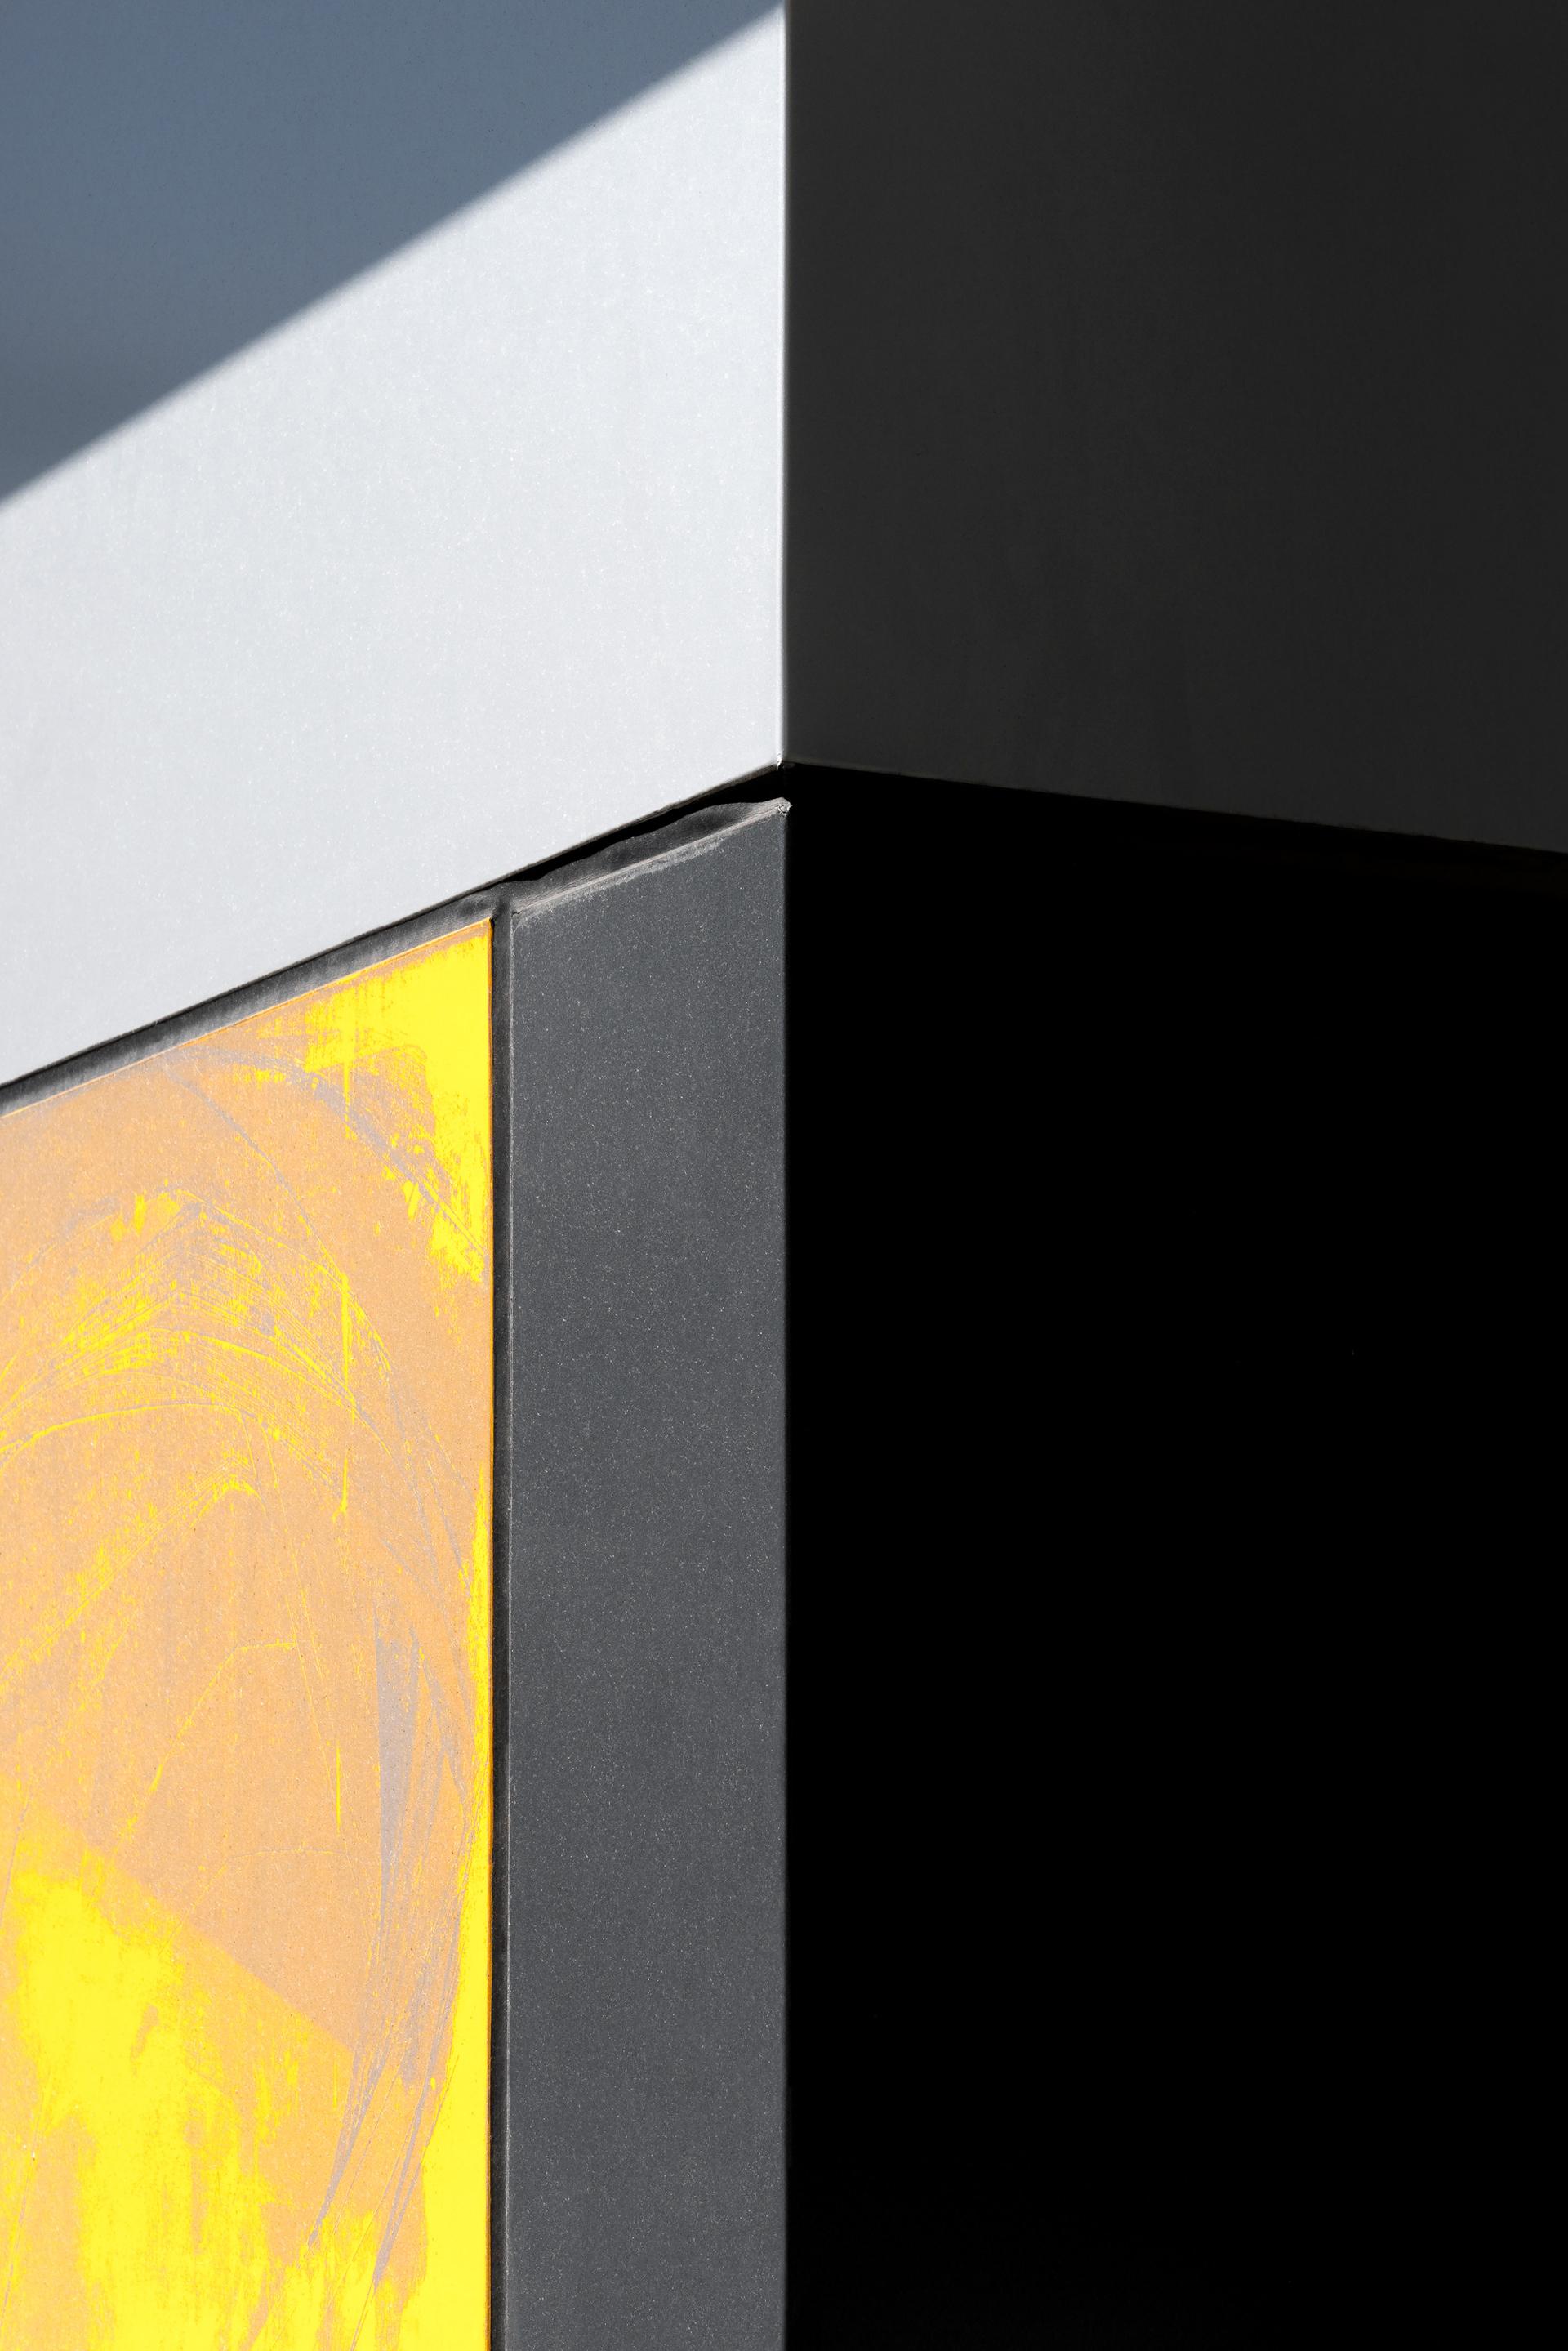 Yellow, Black and Grey by Jon Setter